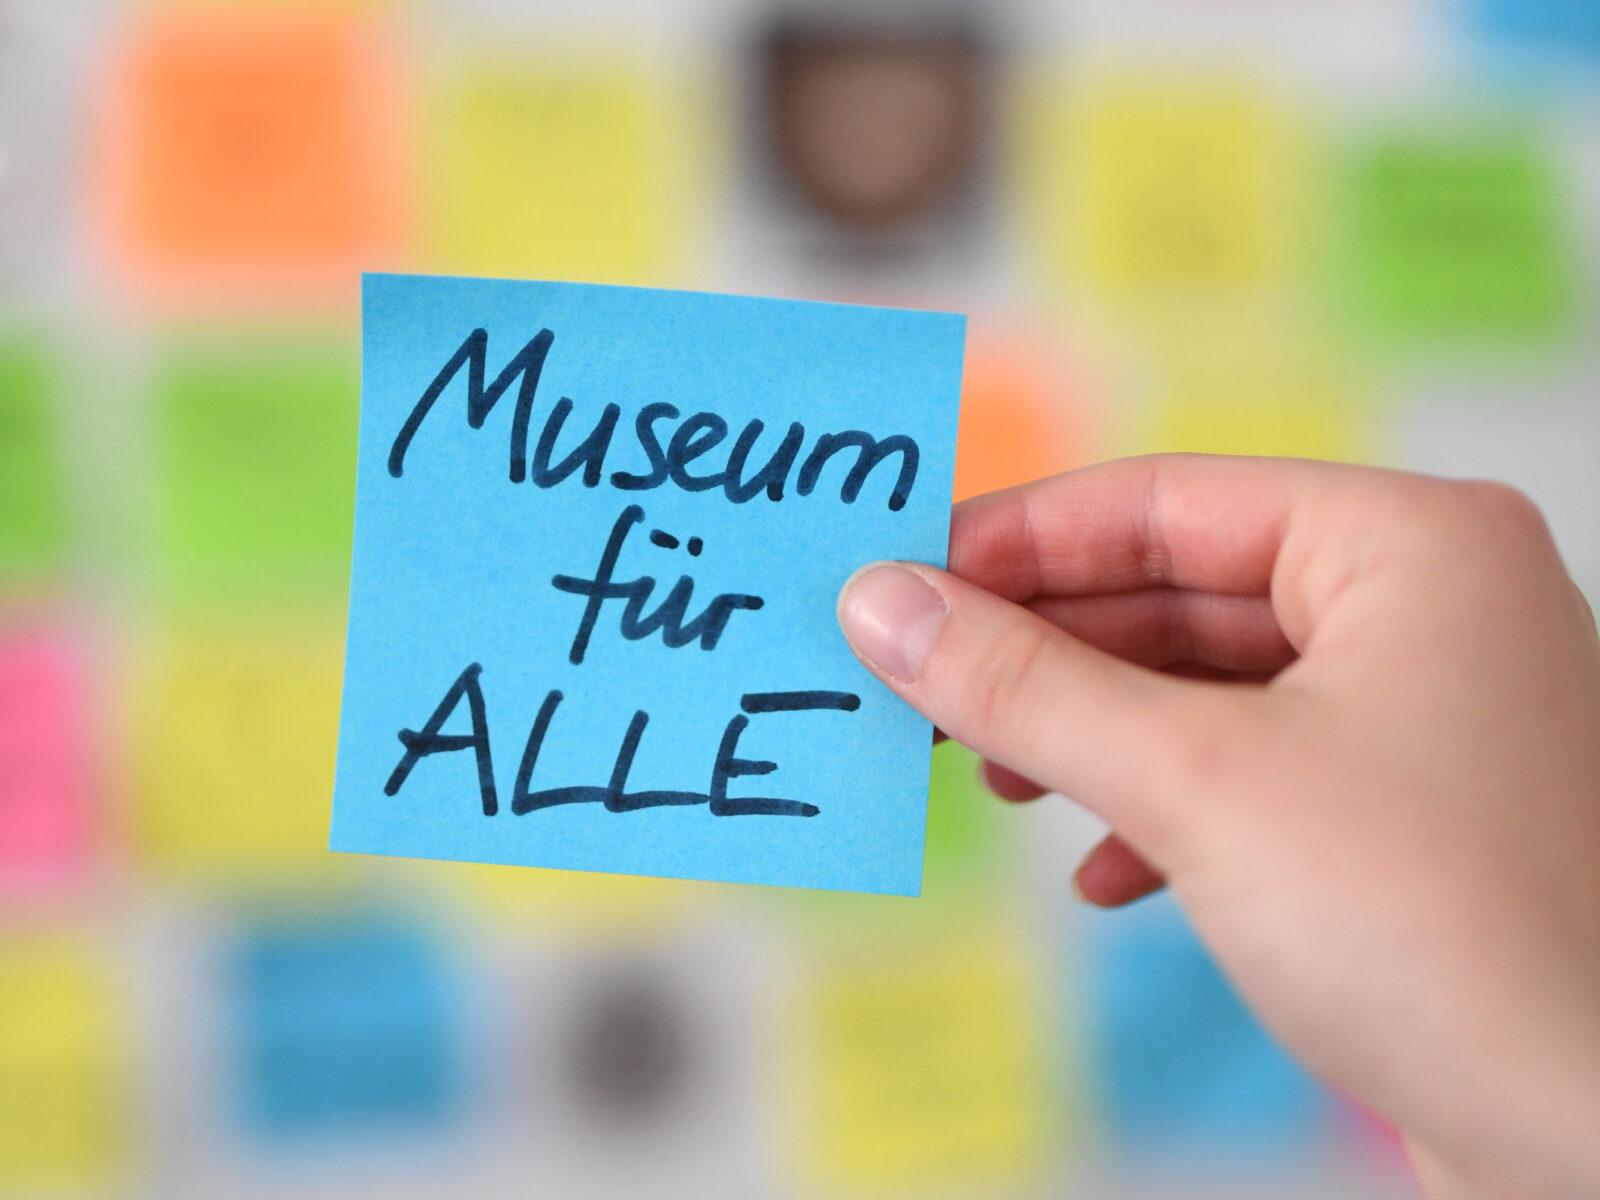 ARTIS-Uli Deck// 06.06.2018 Badisches Landesmuseum Karlsruhe, BLM, Creative Collections